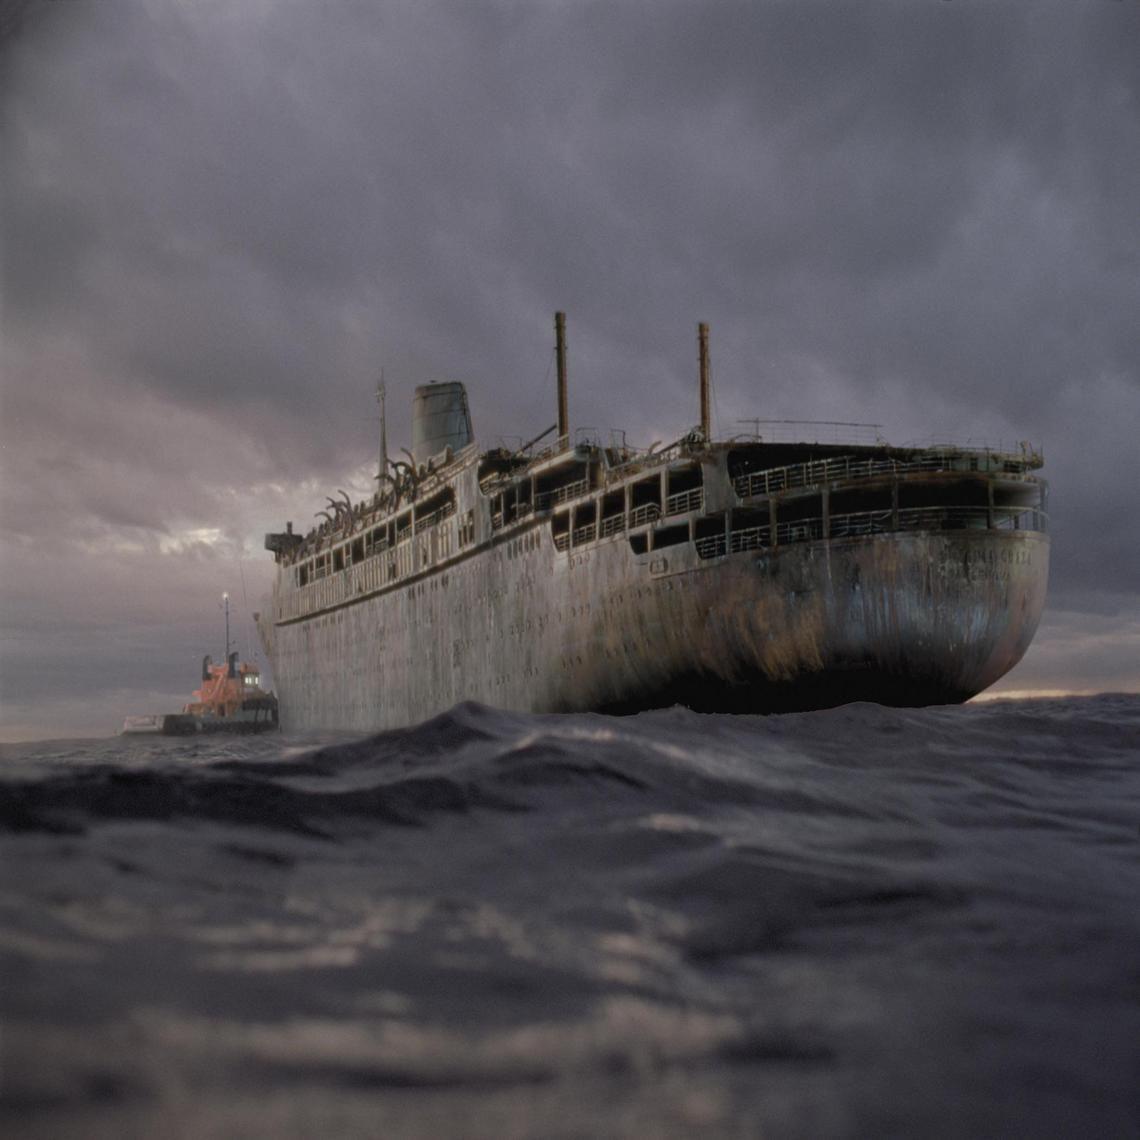 Ghost Ship - The Antonia Graza